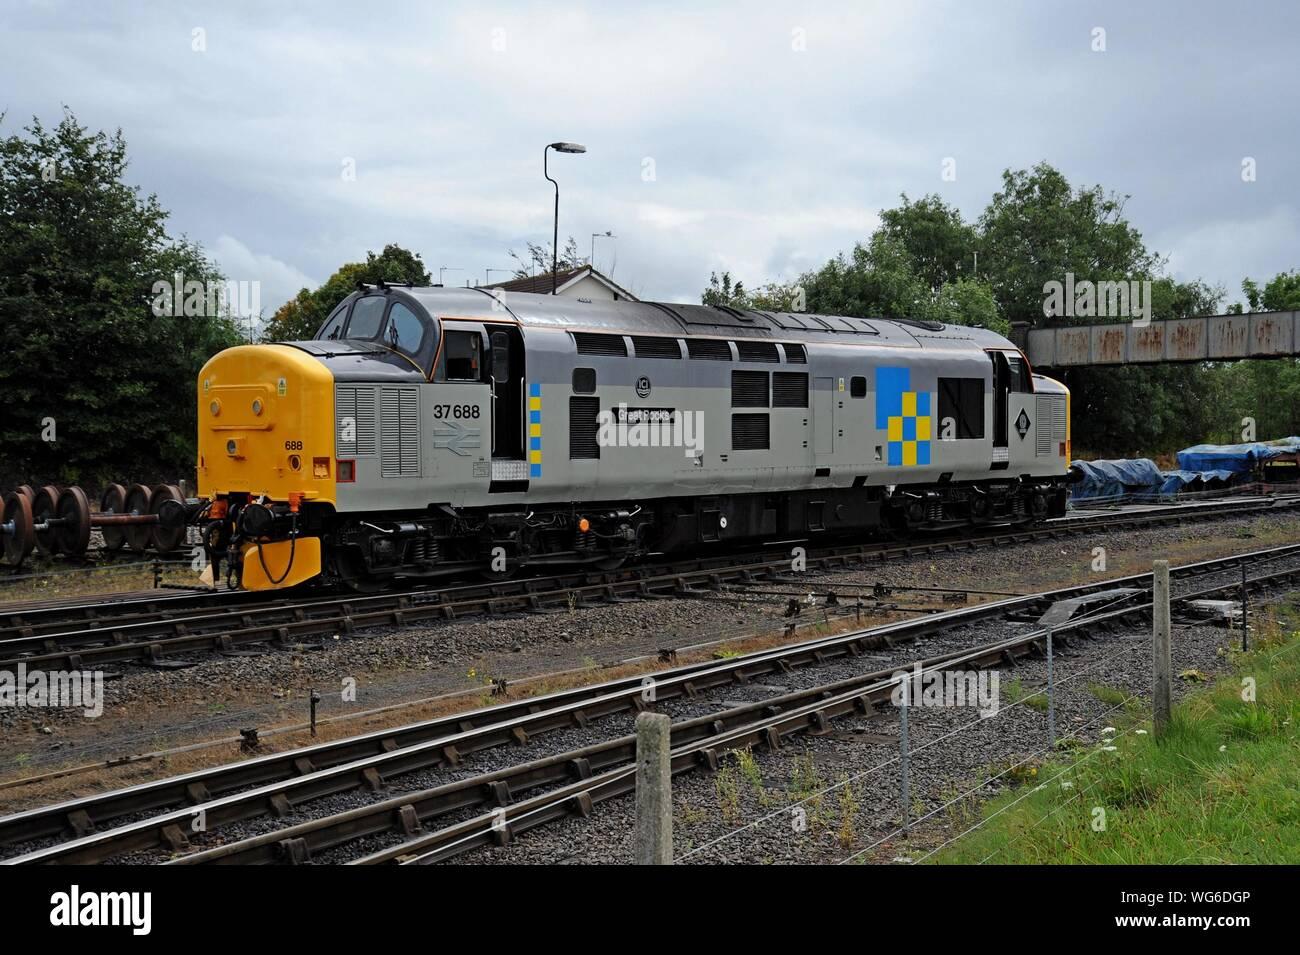 Class 37 English Electric diesel locomotive 37688 'Great Rocks' at Kidderminster station, Severn Valley Railway Stock Photo